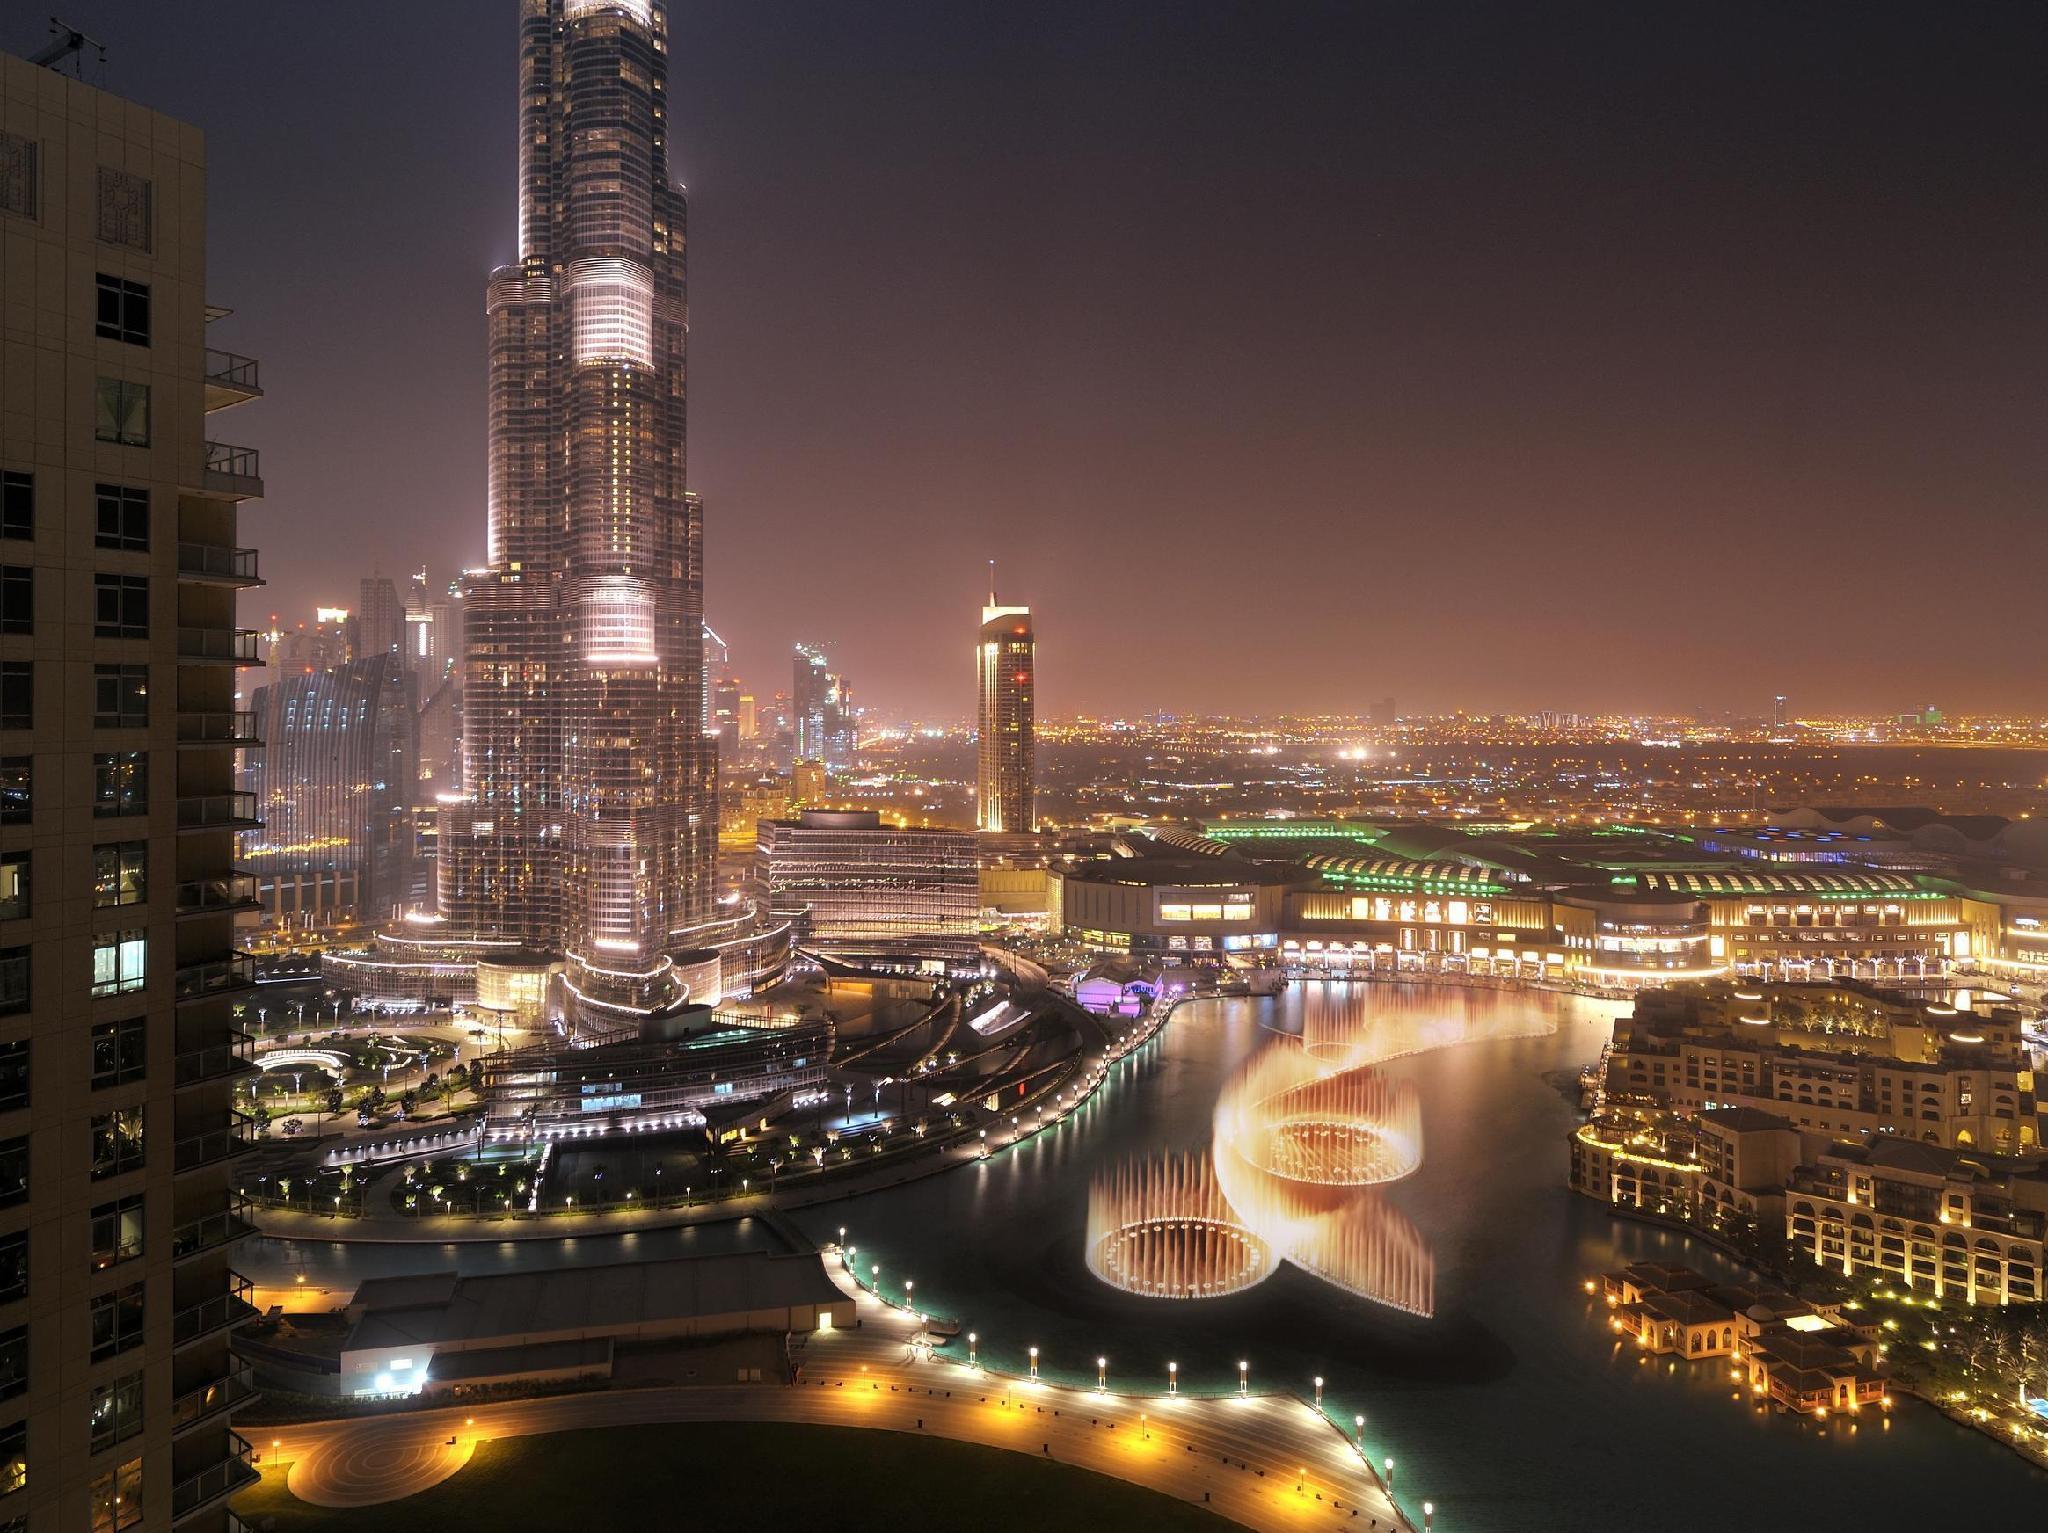 Dubai hotels cheap budget hotel booking 5 star luxury for Cheap hotels in downtown dubai